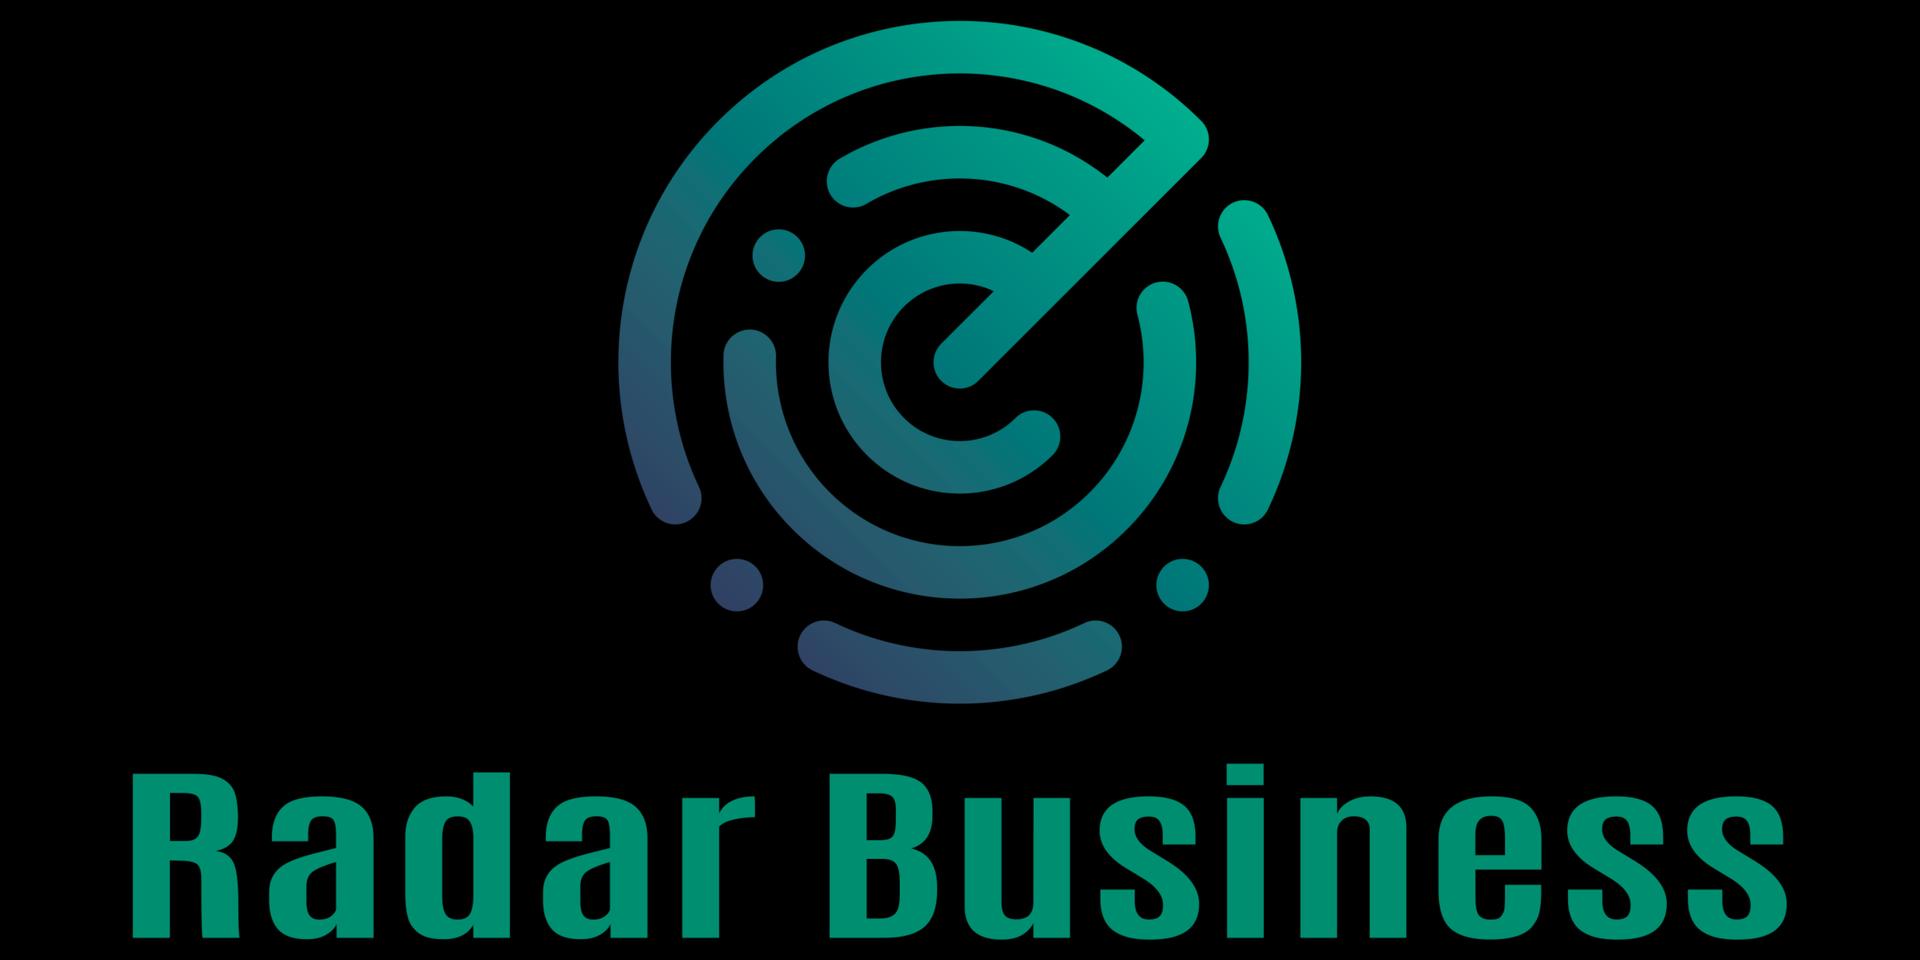 Radar Business